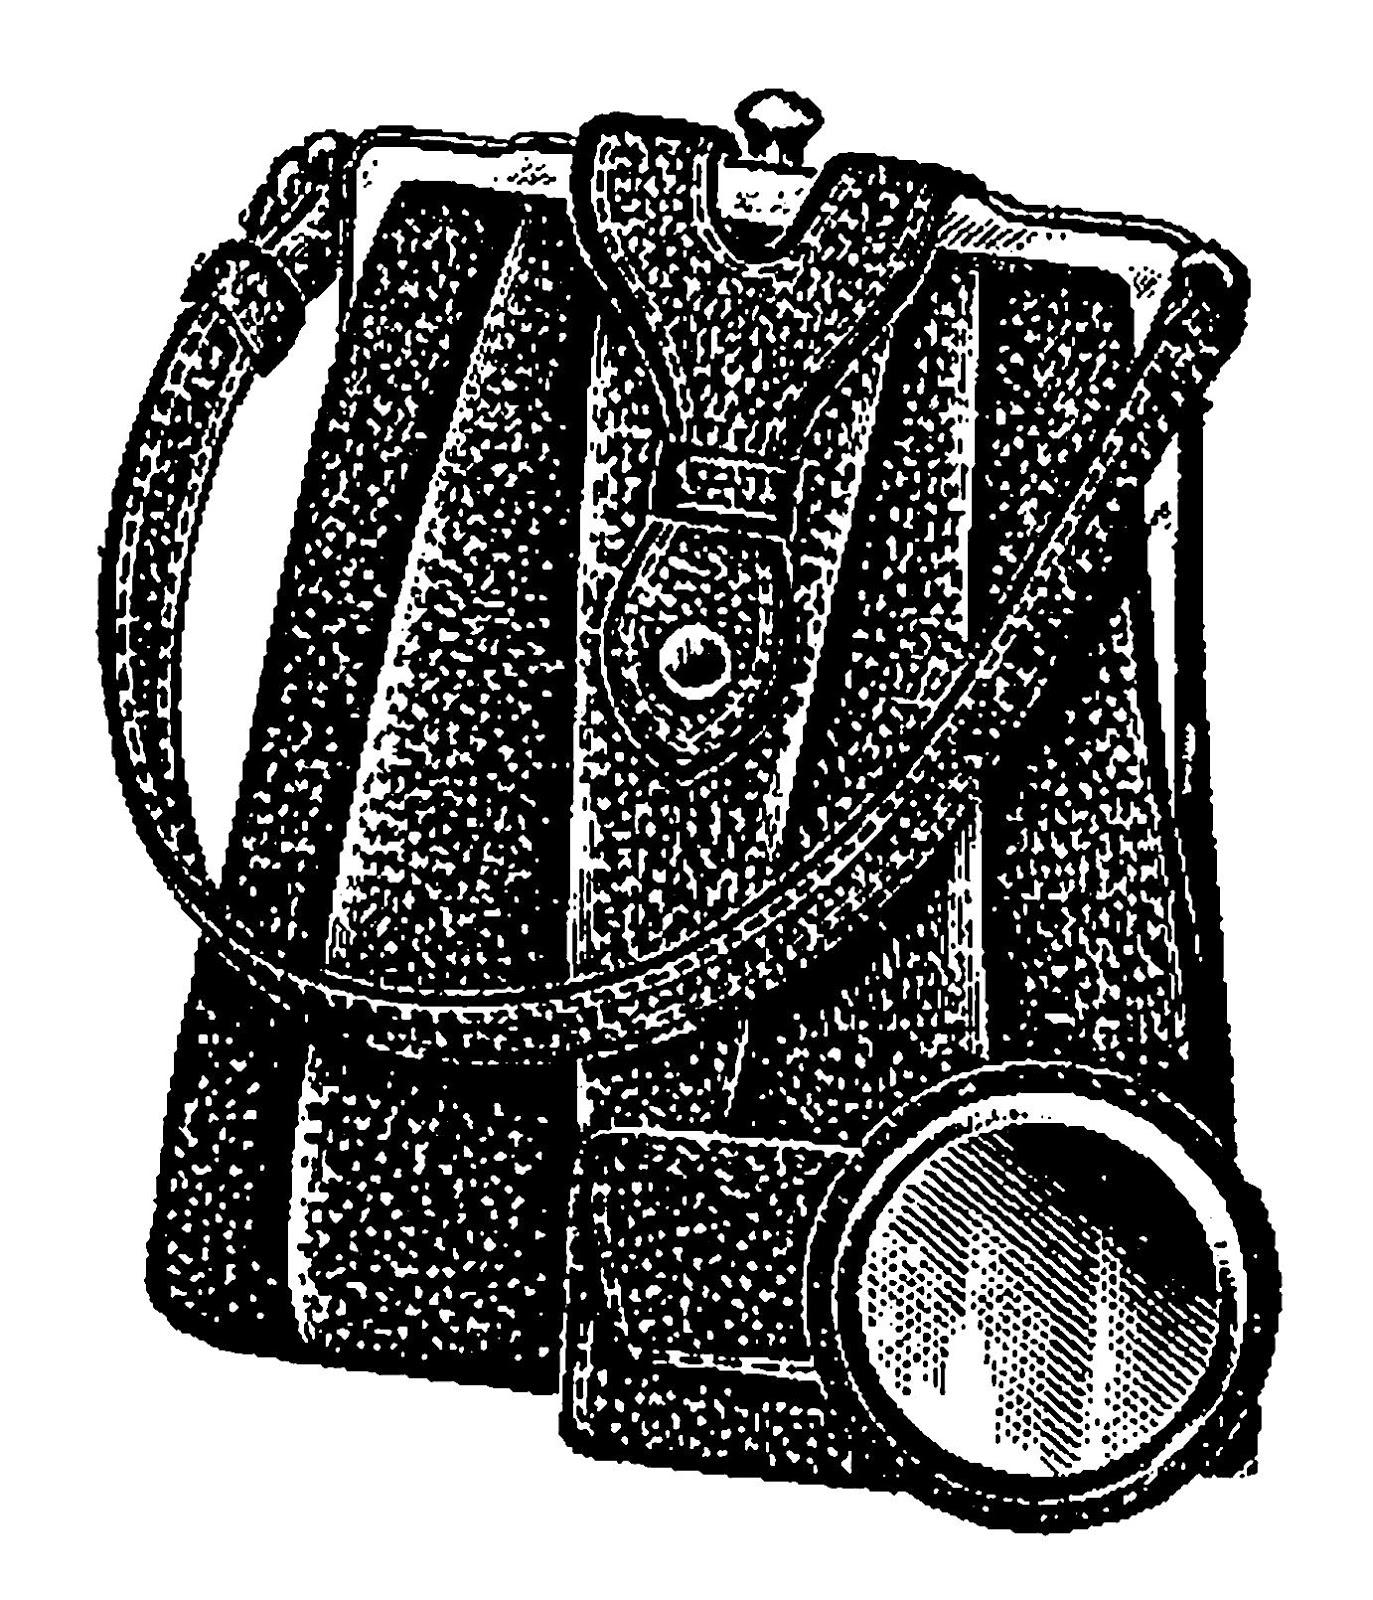 Vintage purse clipart image freeuse library Digital Stamp Design: Vintage Purse Fashion Image Women\'s ... image freeuse library